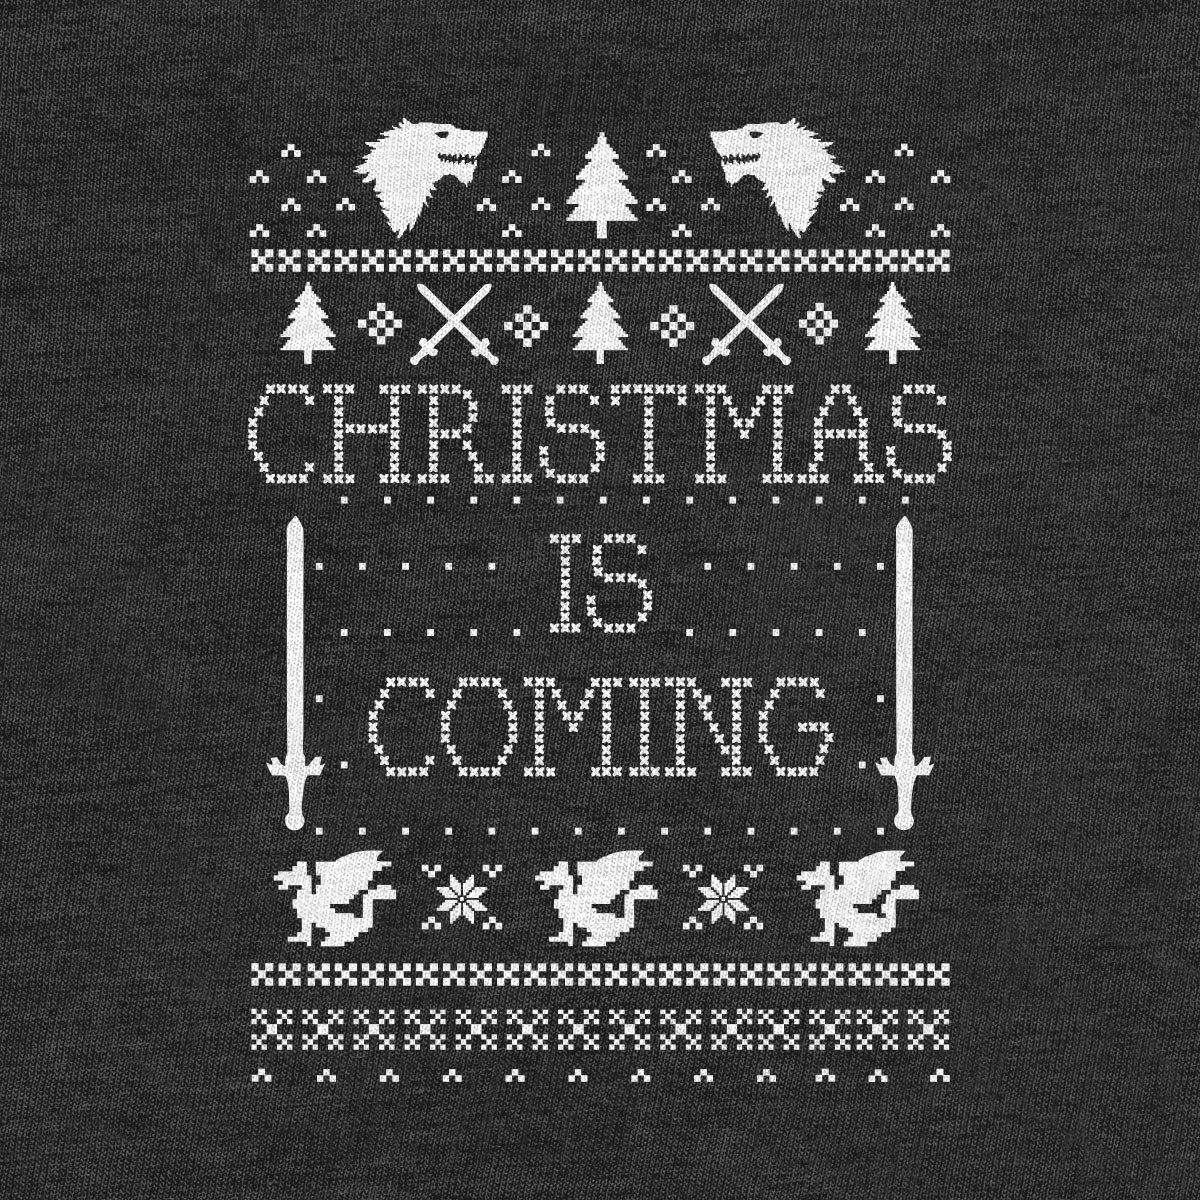 Green Turtle T-Shirts Christmas is Coming Weihnachtspullover M/änner f/ür GOT Fans Sweatshirt